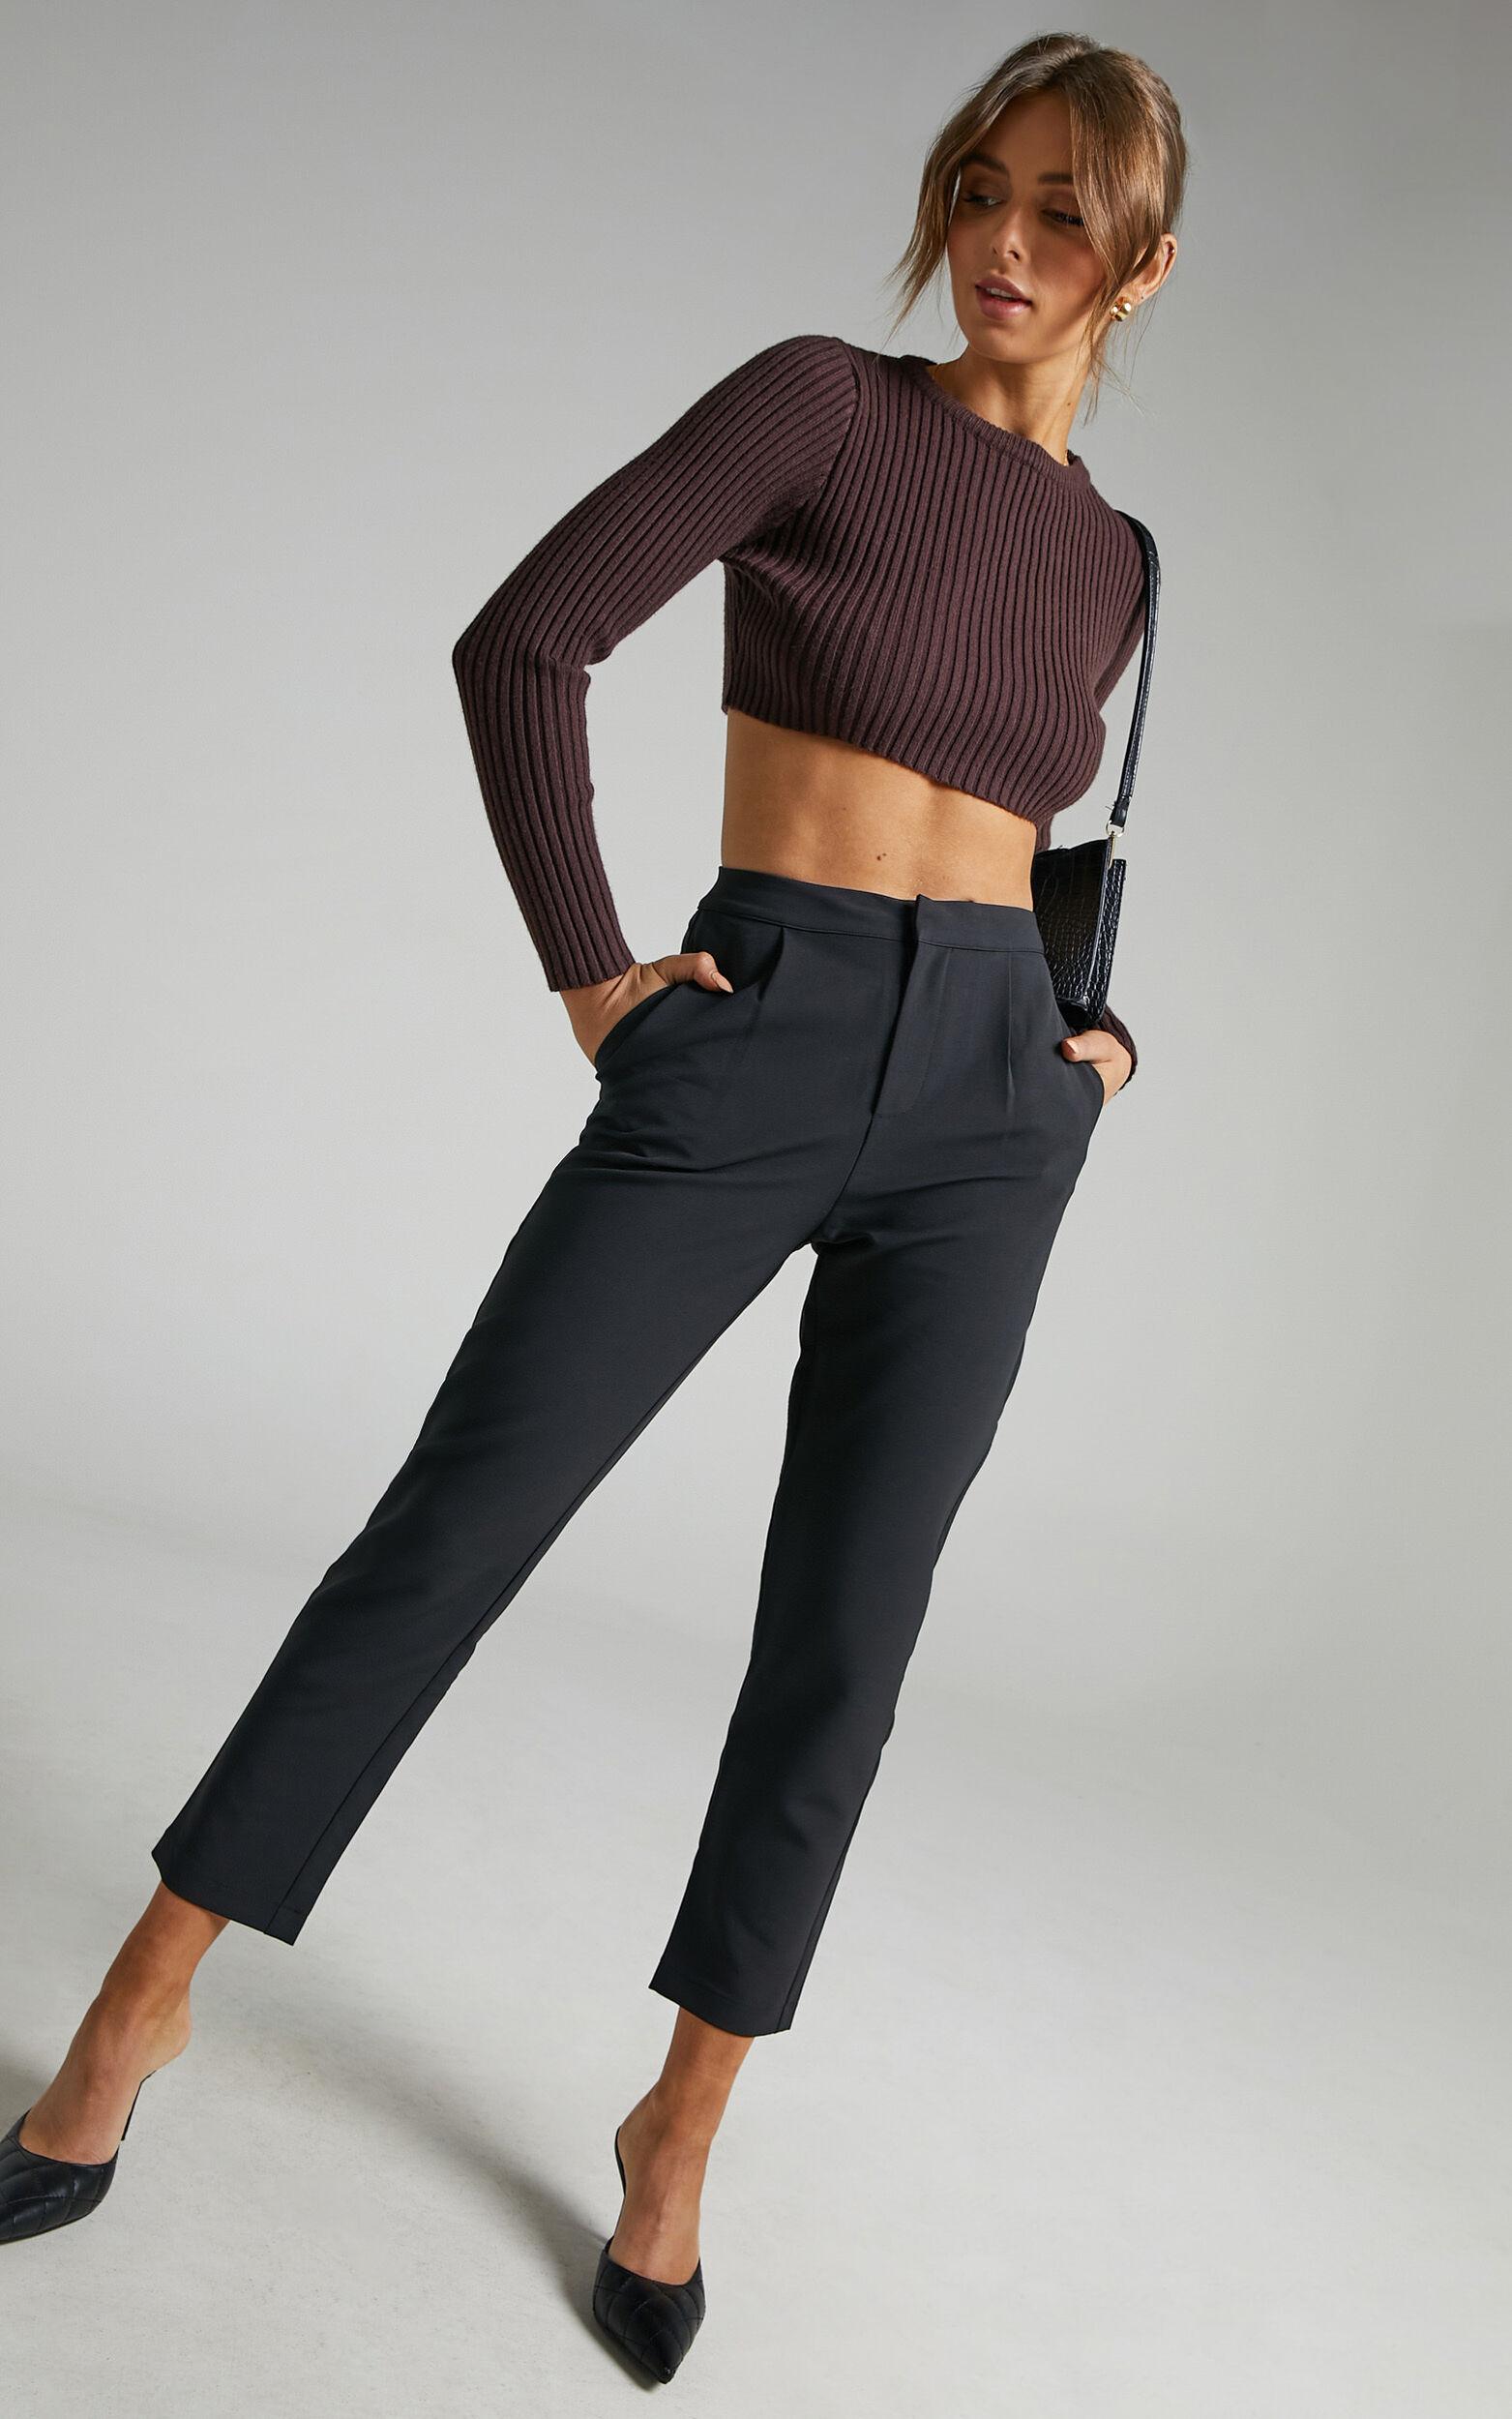 Damika Cropped Pin Tuck Pants in Black - 04, BLK1, super-hi-res image number null